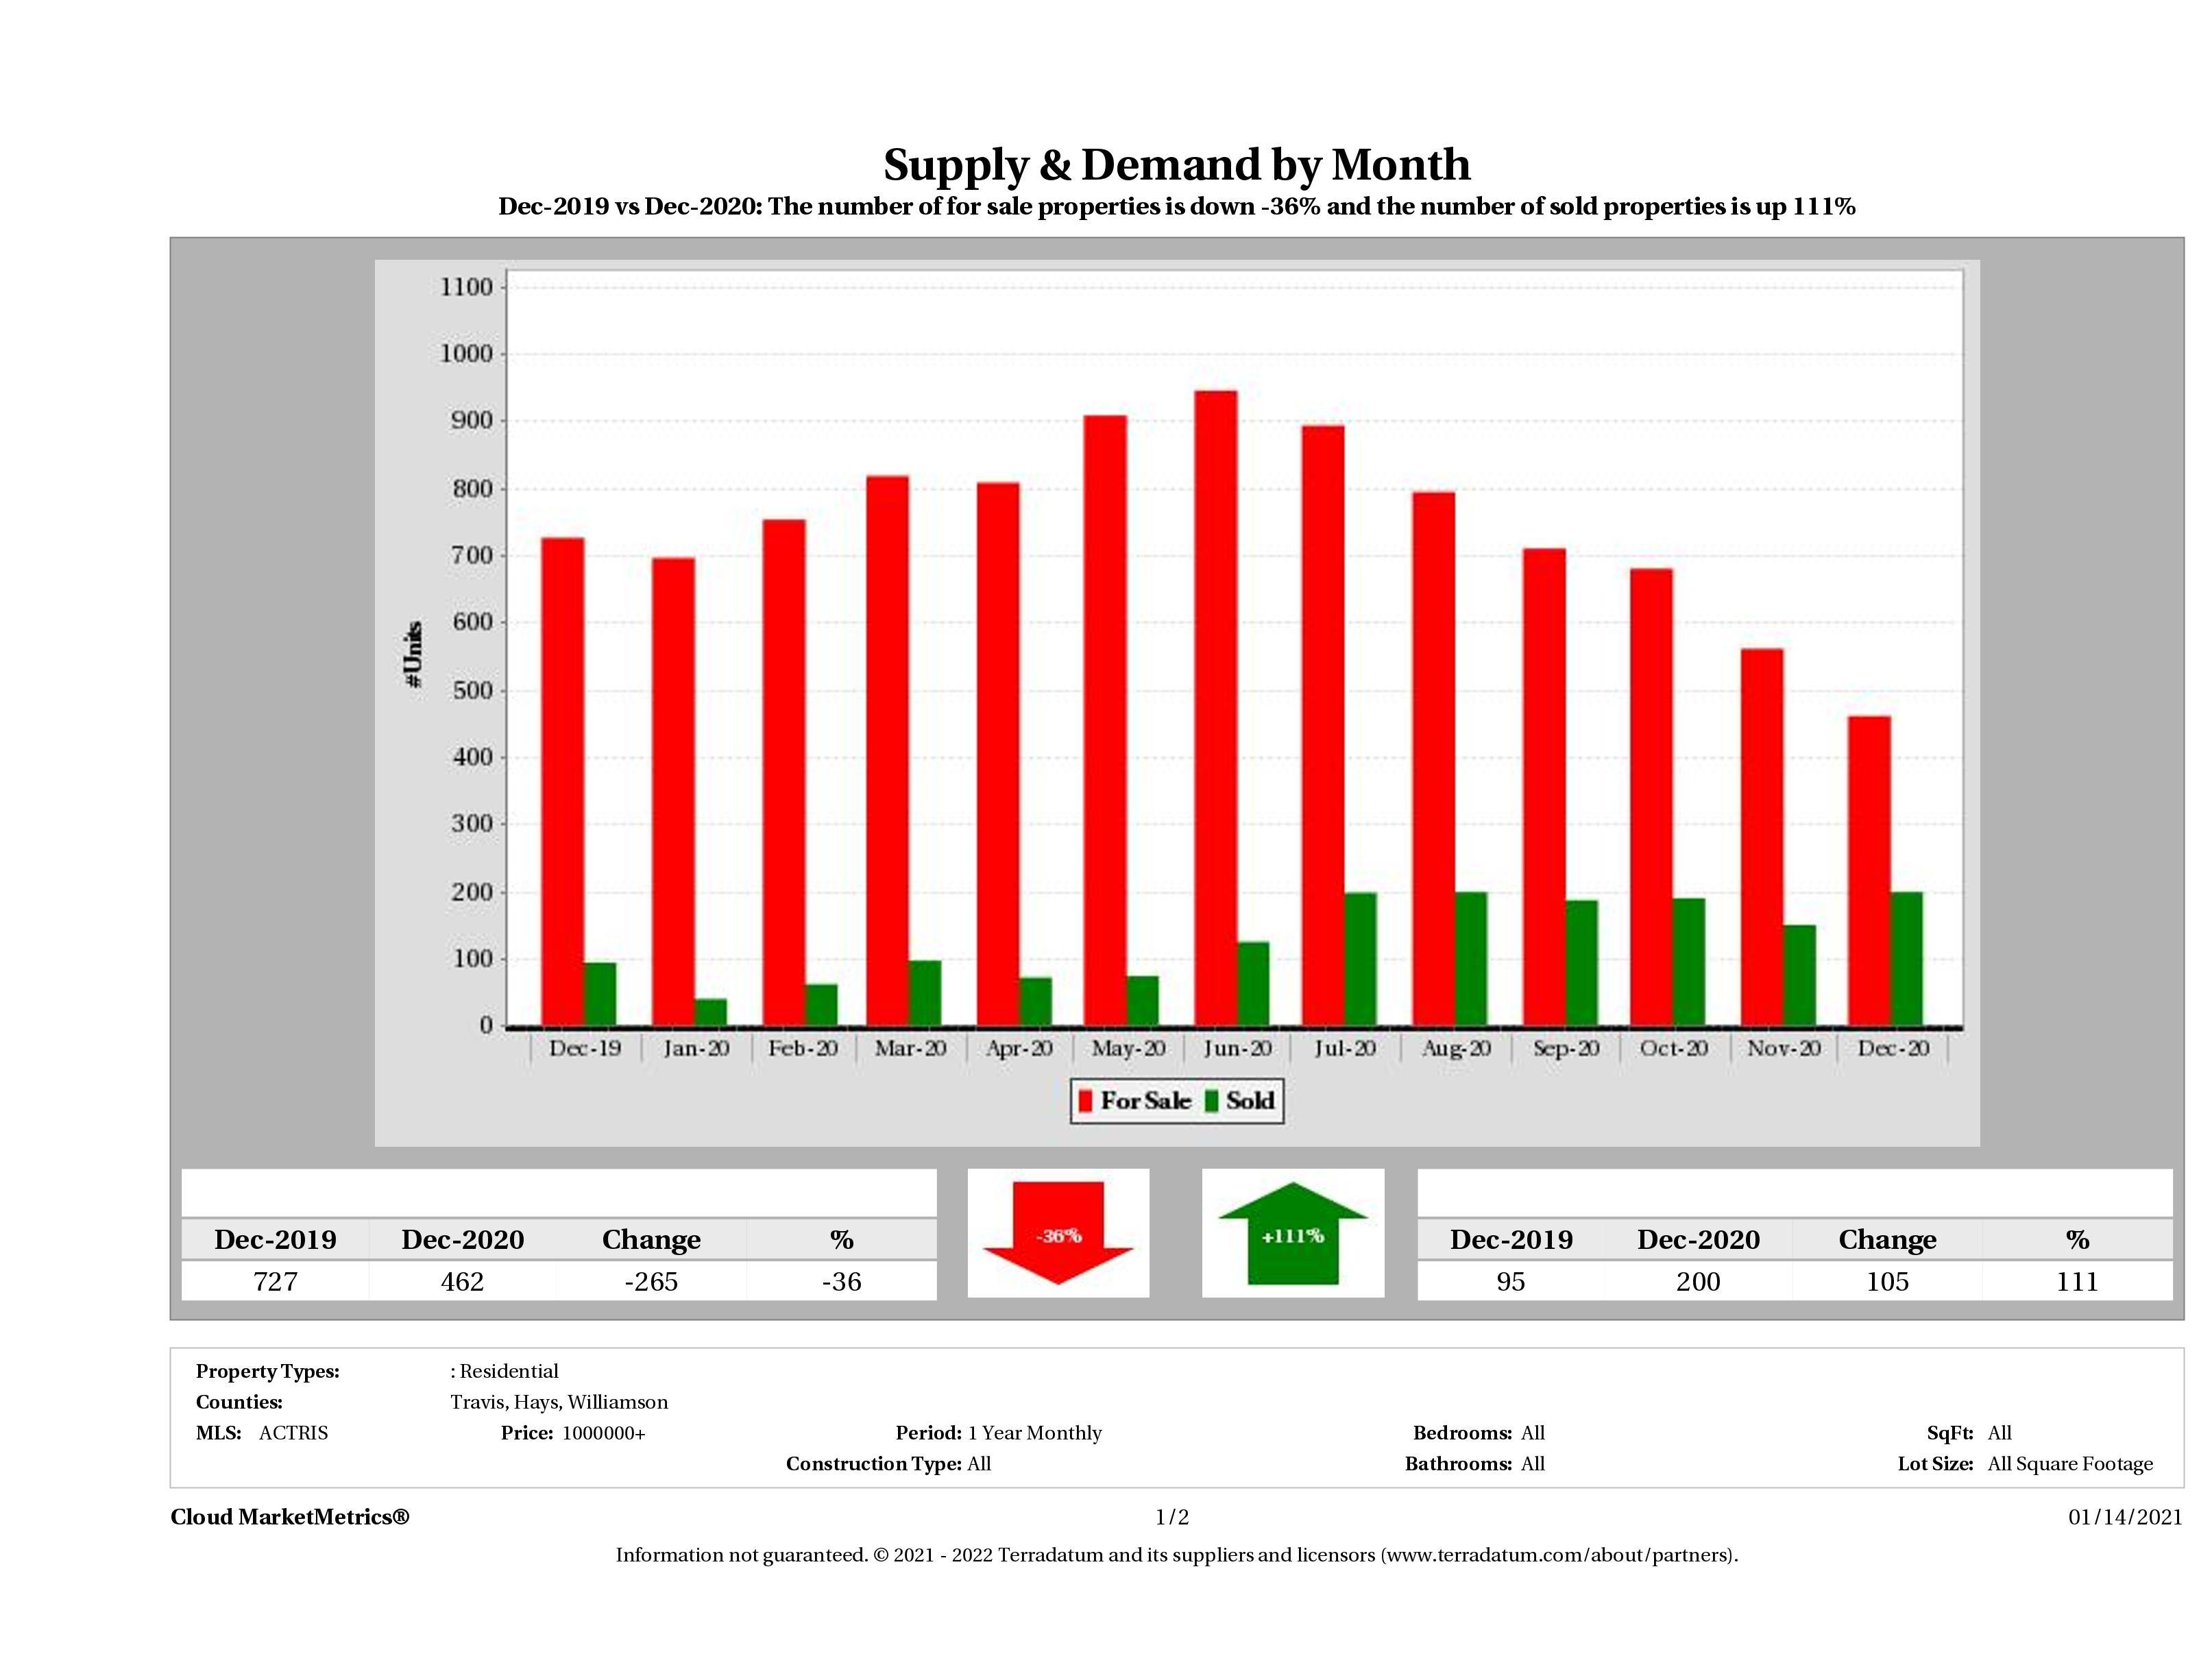 Austin luxury real estate market supply and demand December 2020